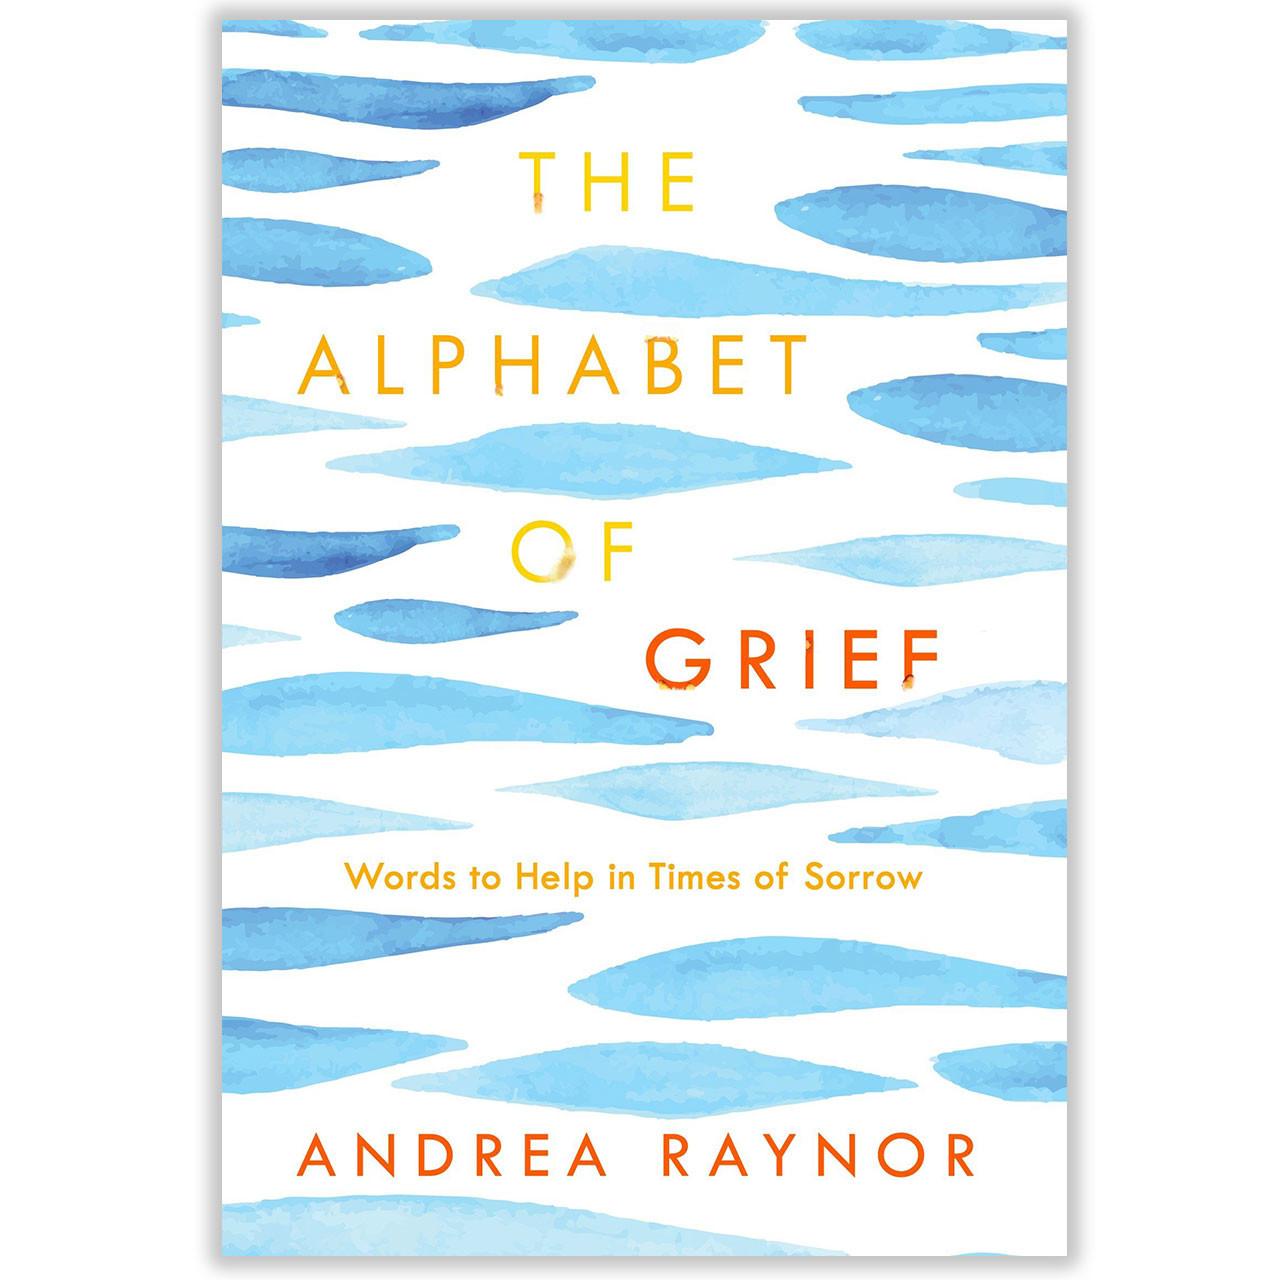 The Alphabet of Grief